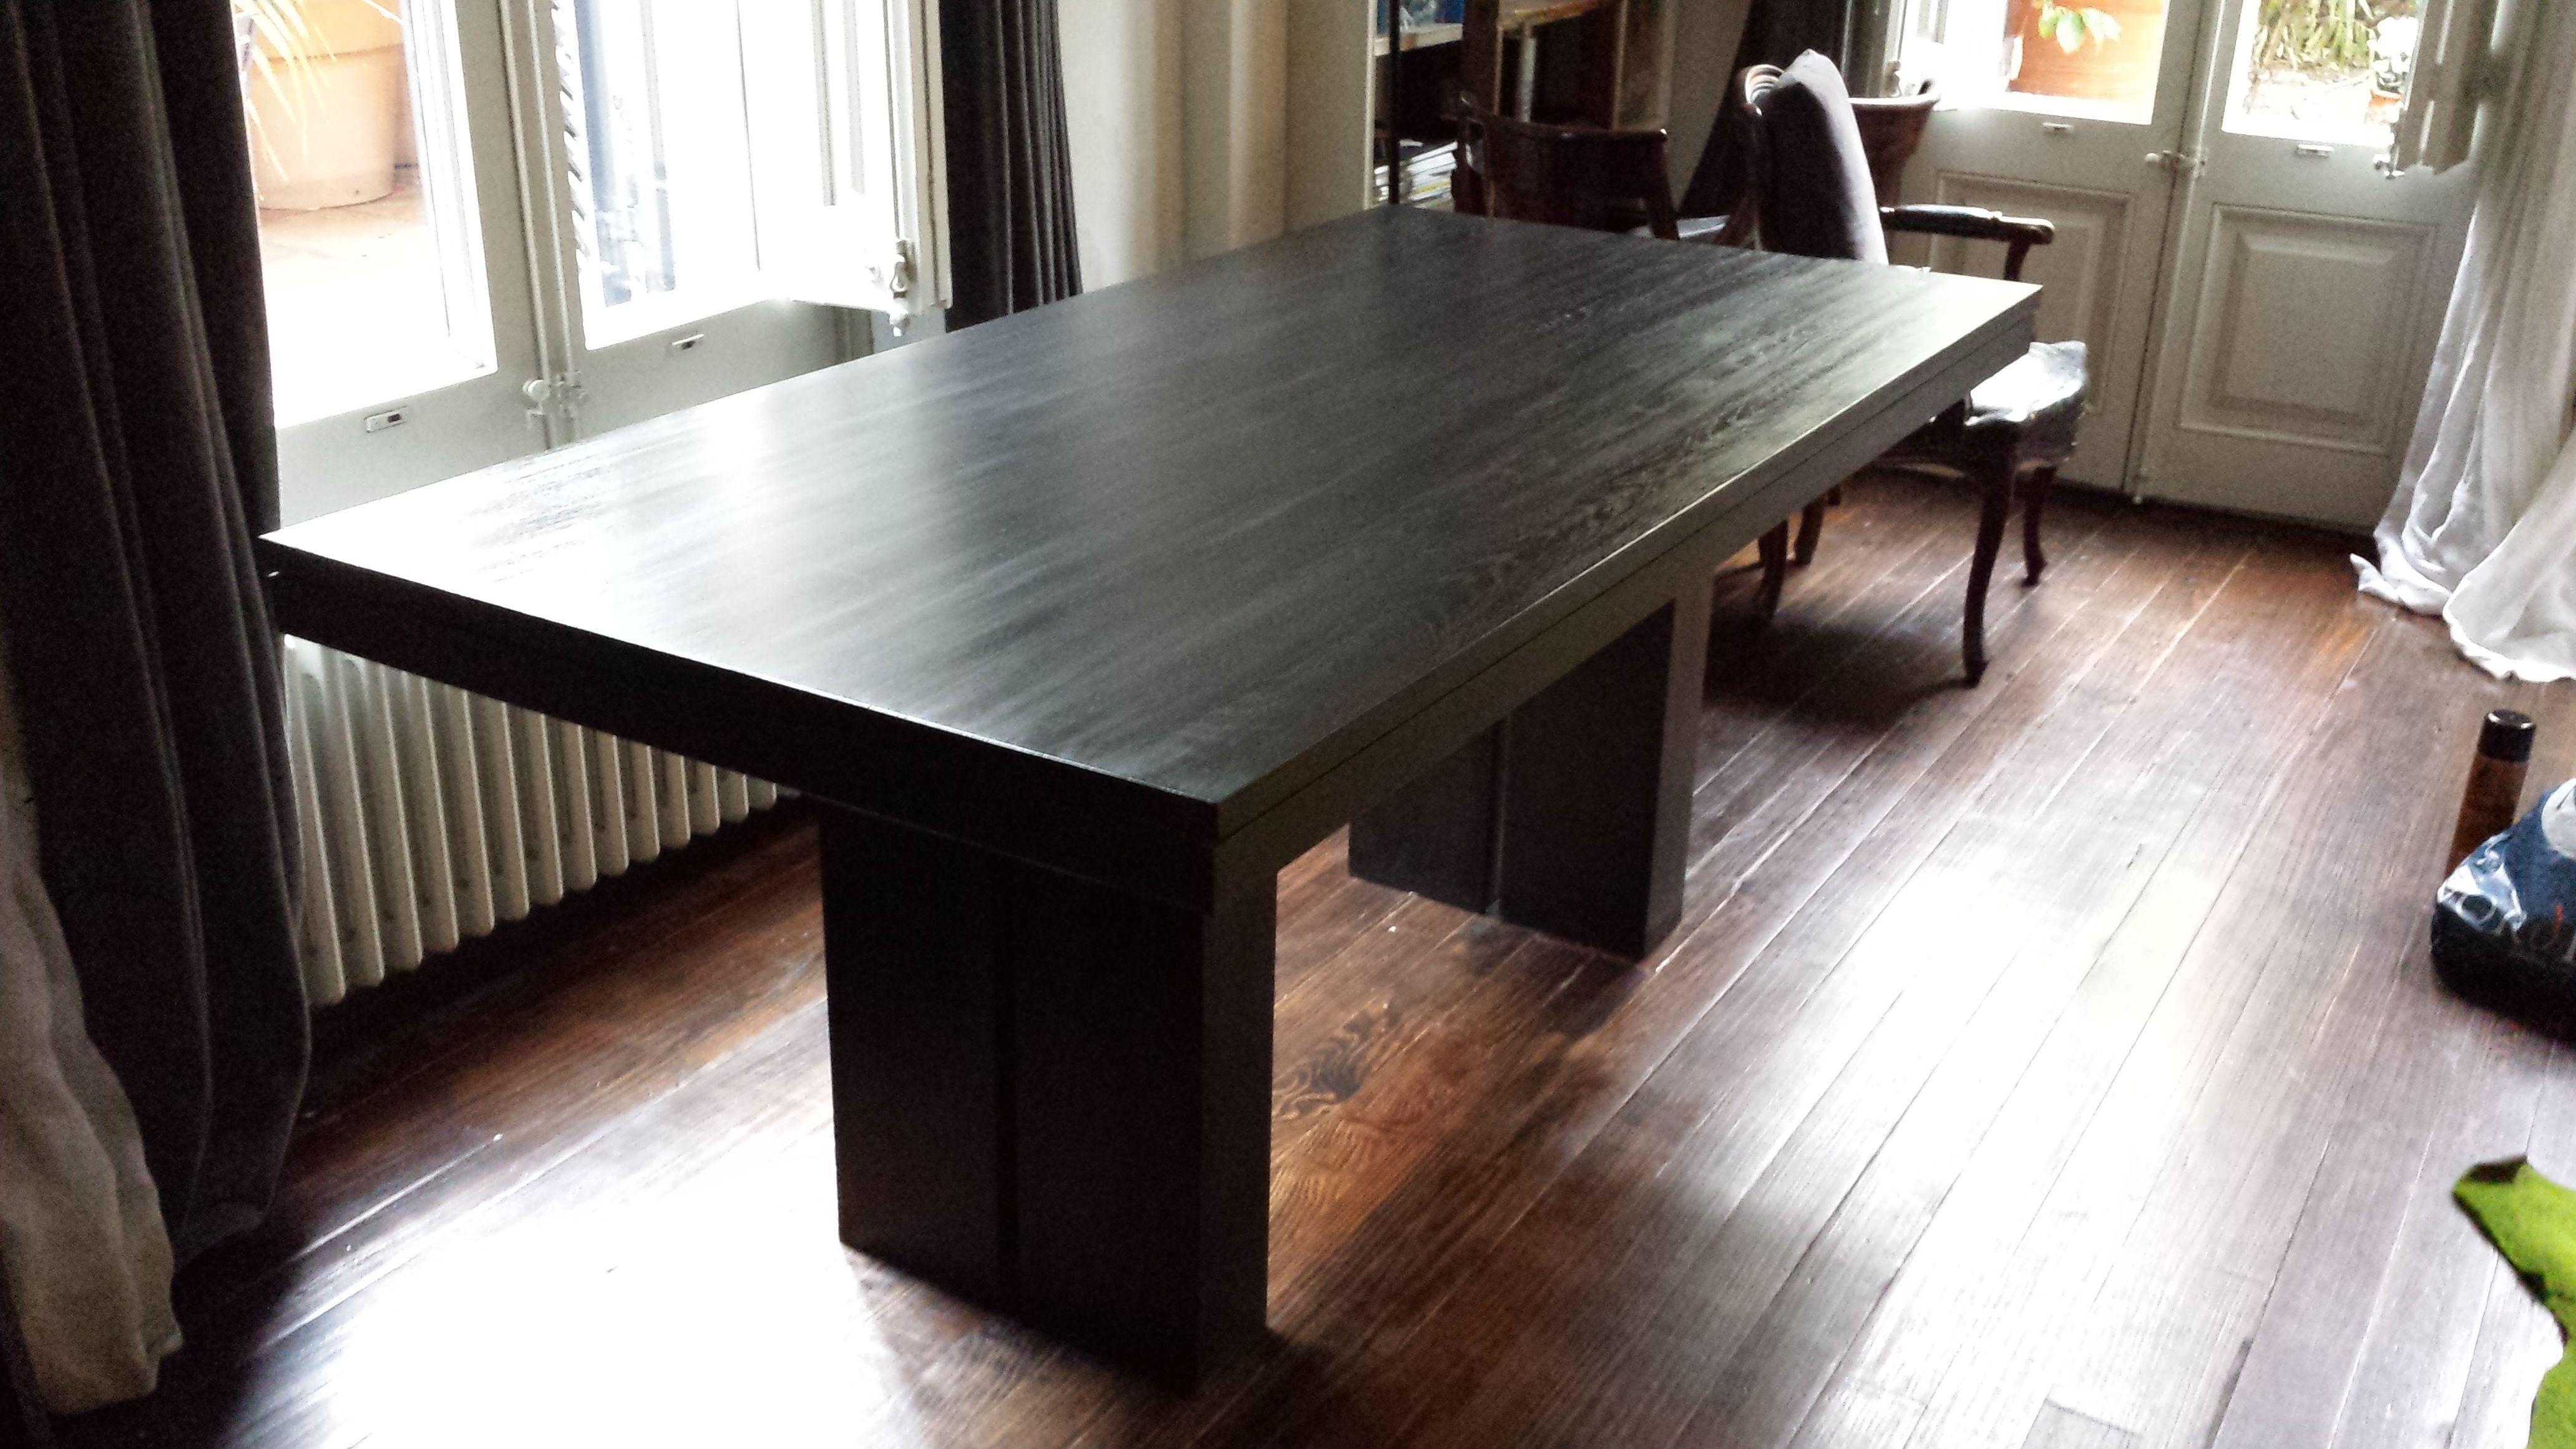 Mesa rectangular de madera y dise o minimalista acabada en for Comedor minimalista